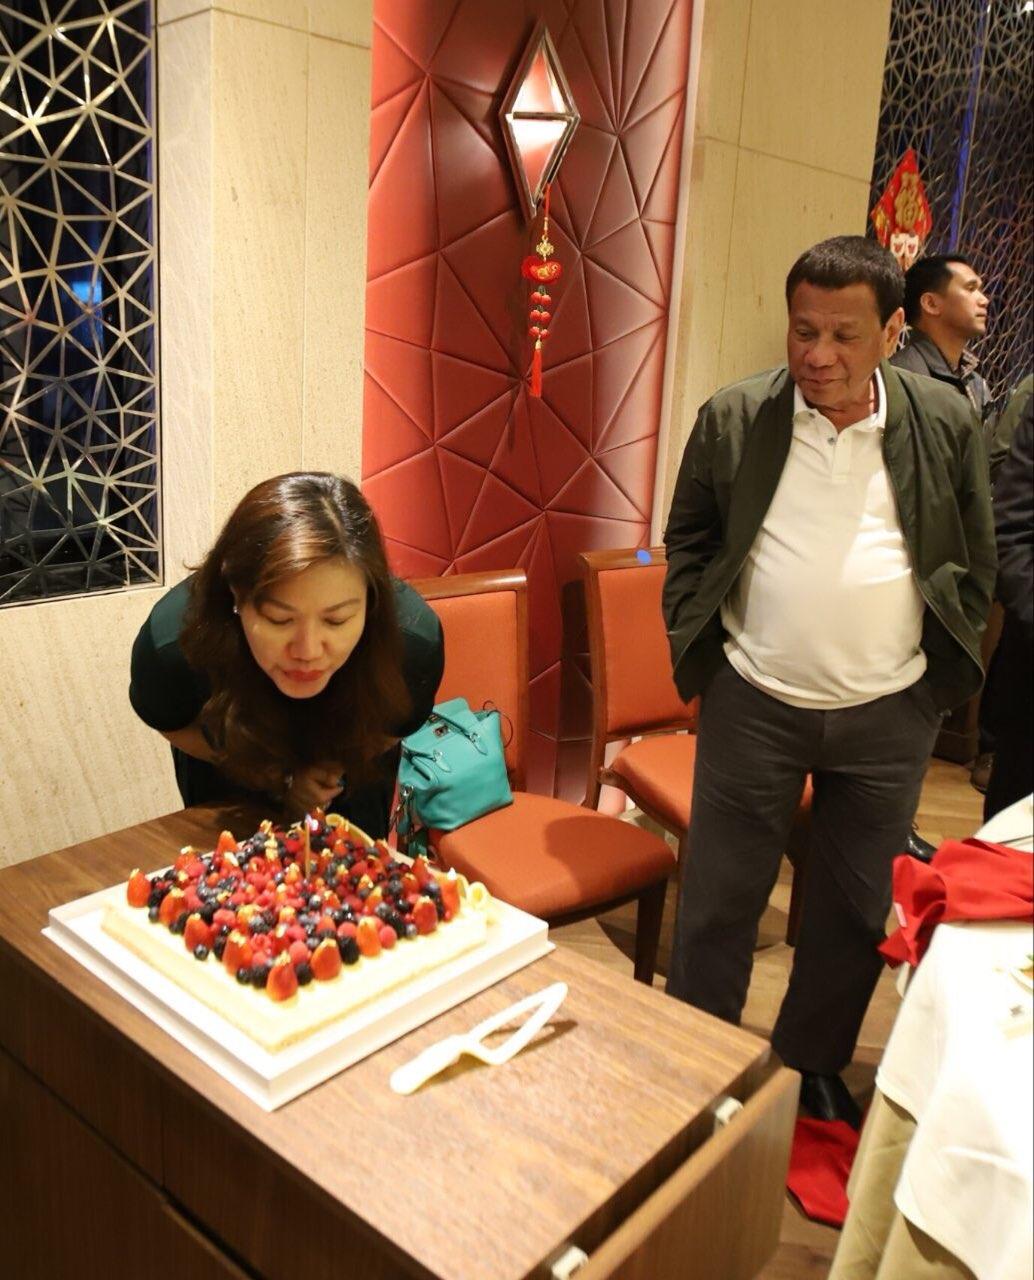 BIRTHDAY. President Rodrigo Duterte looks on as his longtime partner Honeylet Avanceu00f1a blows a birthday cake in Hong Kong on February 16, 2019. Photo from Bong Go